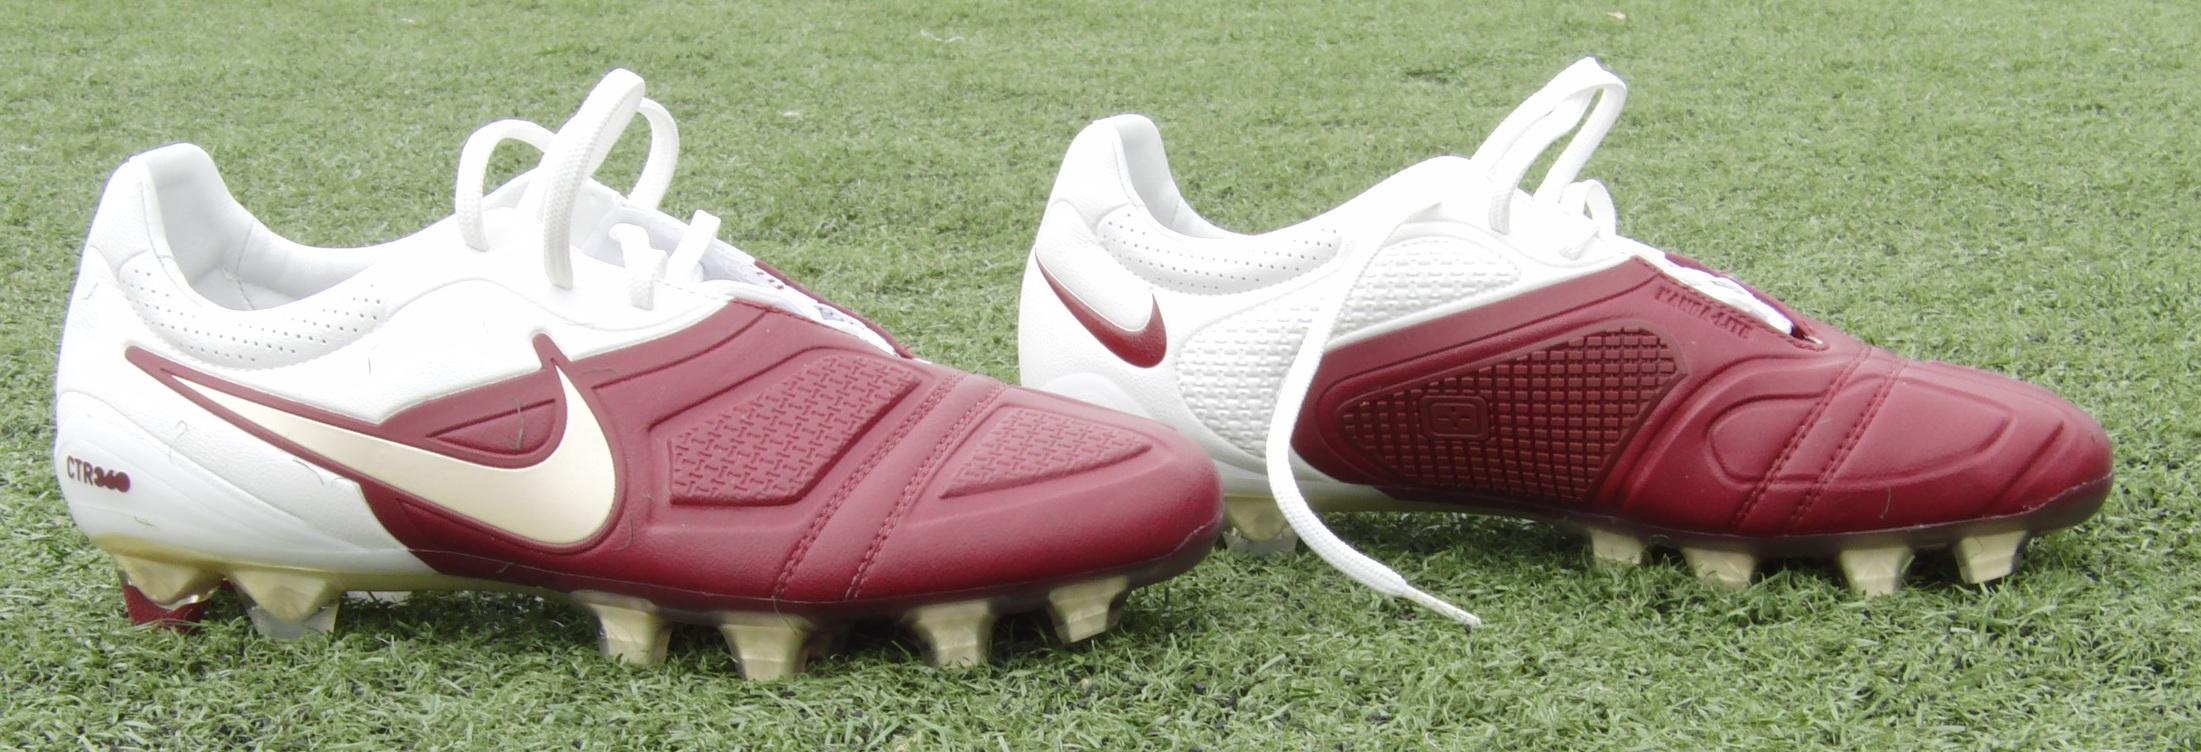 Nike CTR360 Maestri Review – Soccer Cleats 101 adad7f1c56b8a